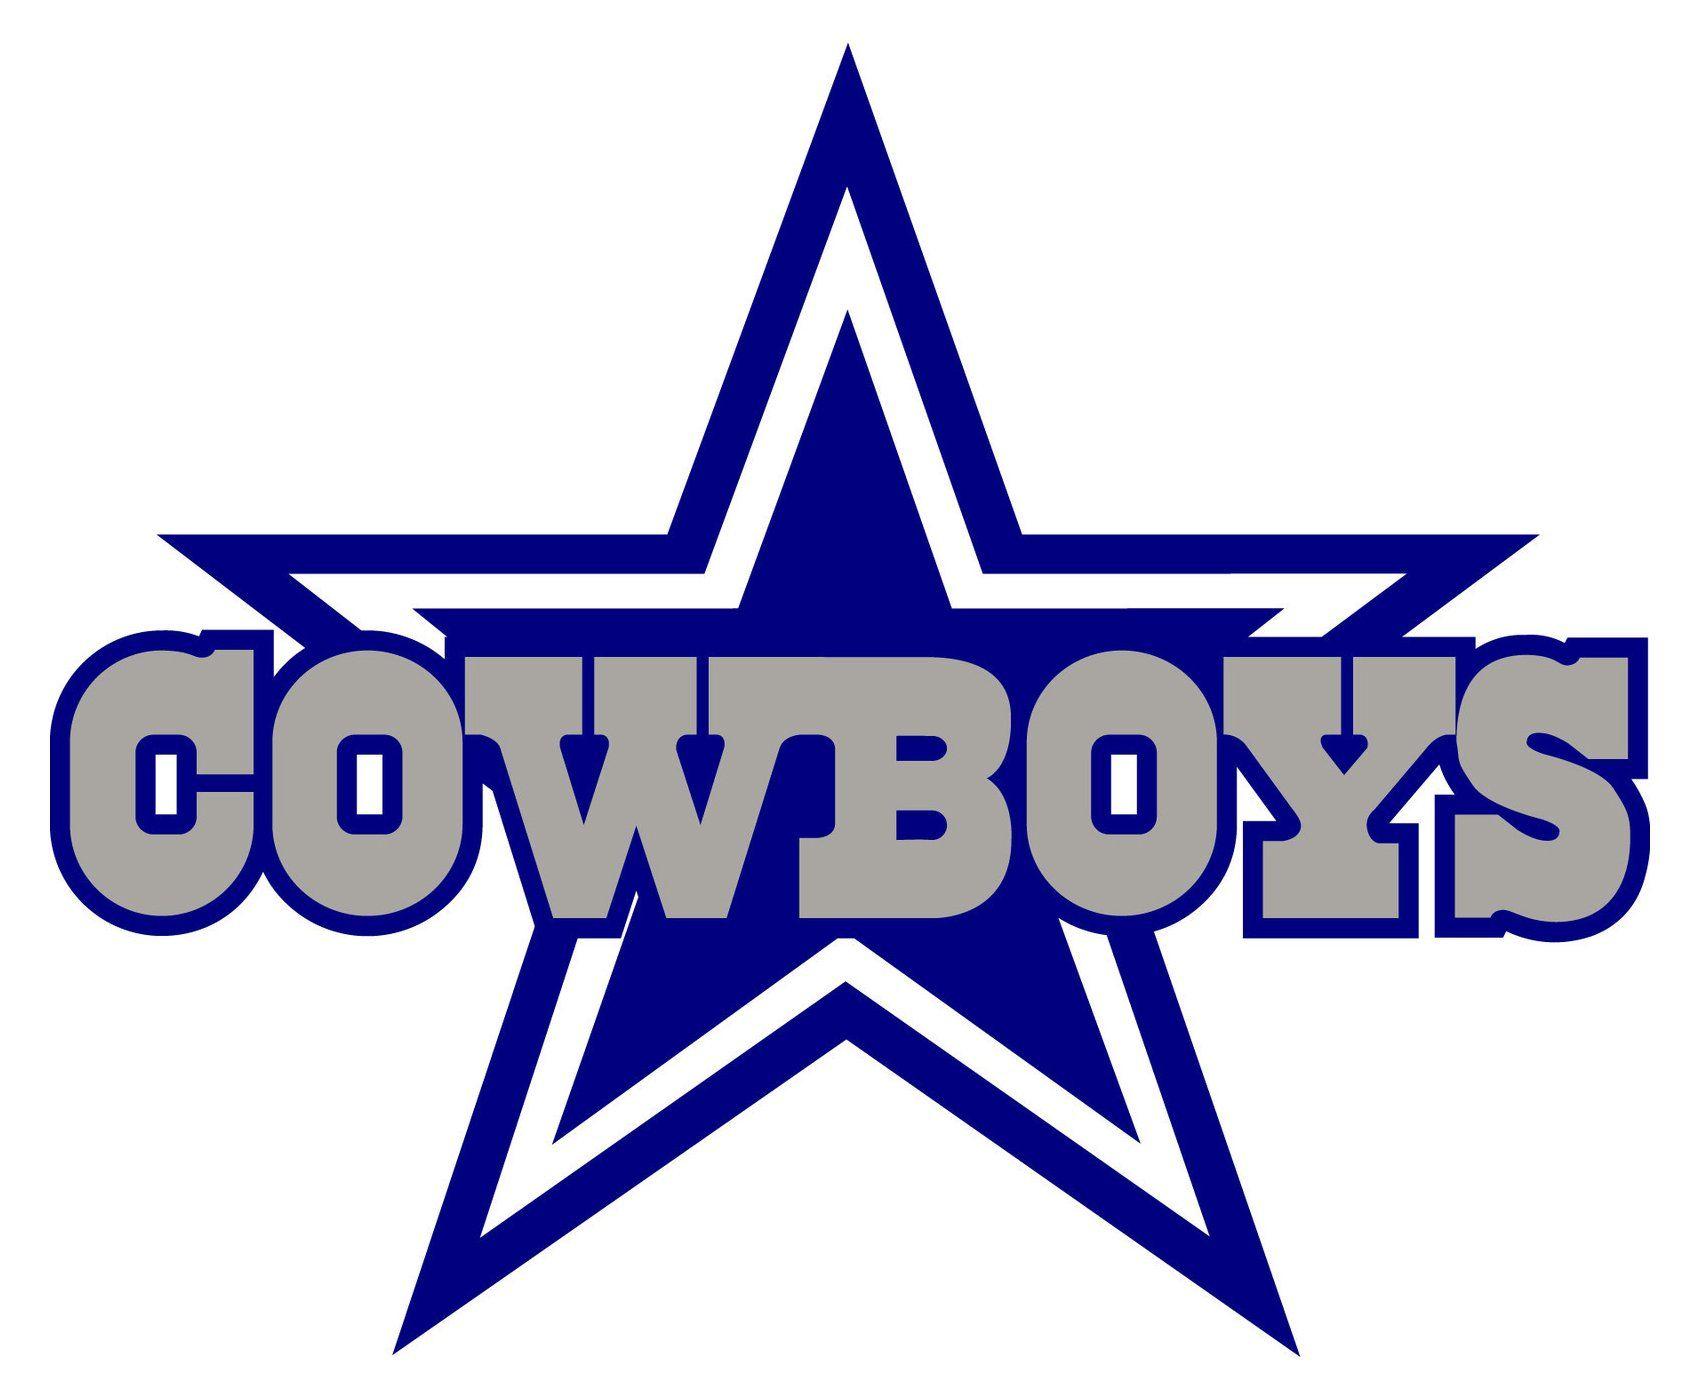 Meaning Dallas Cowboys Logo And Symbol History And Evolution Dallas Cowboys Stickers Dallas Cowboys Logo Dallas Cowboys